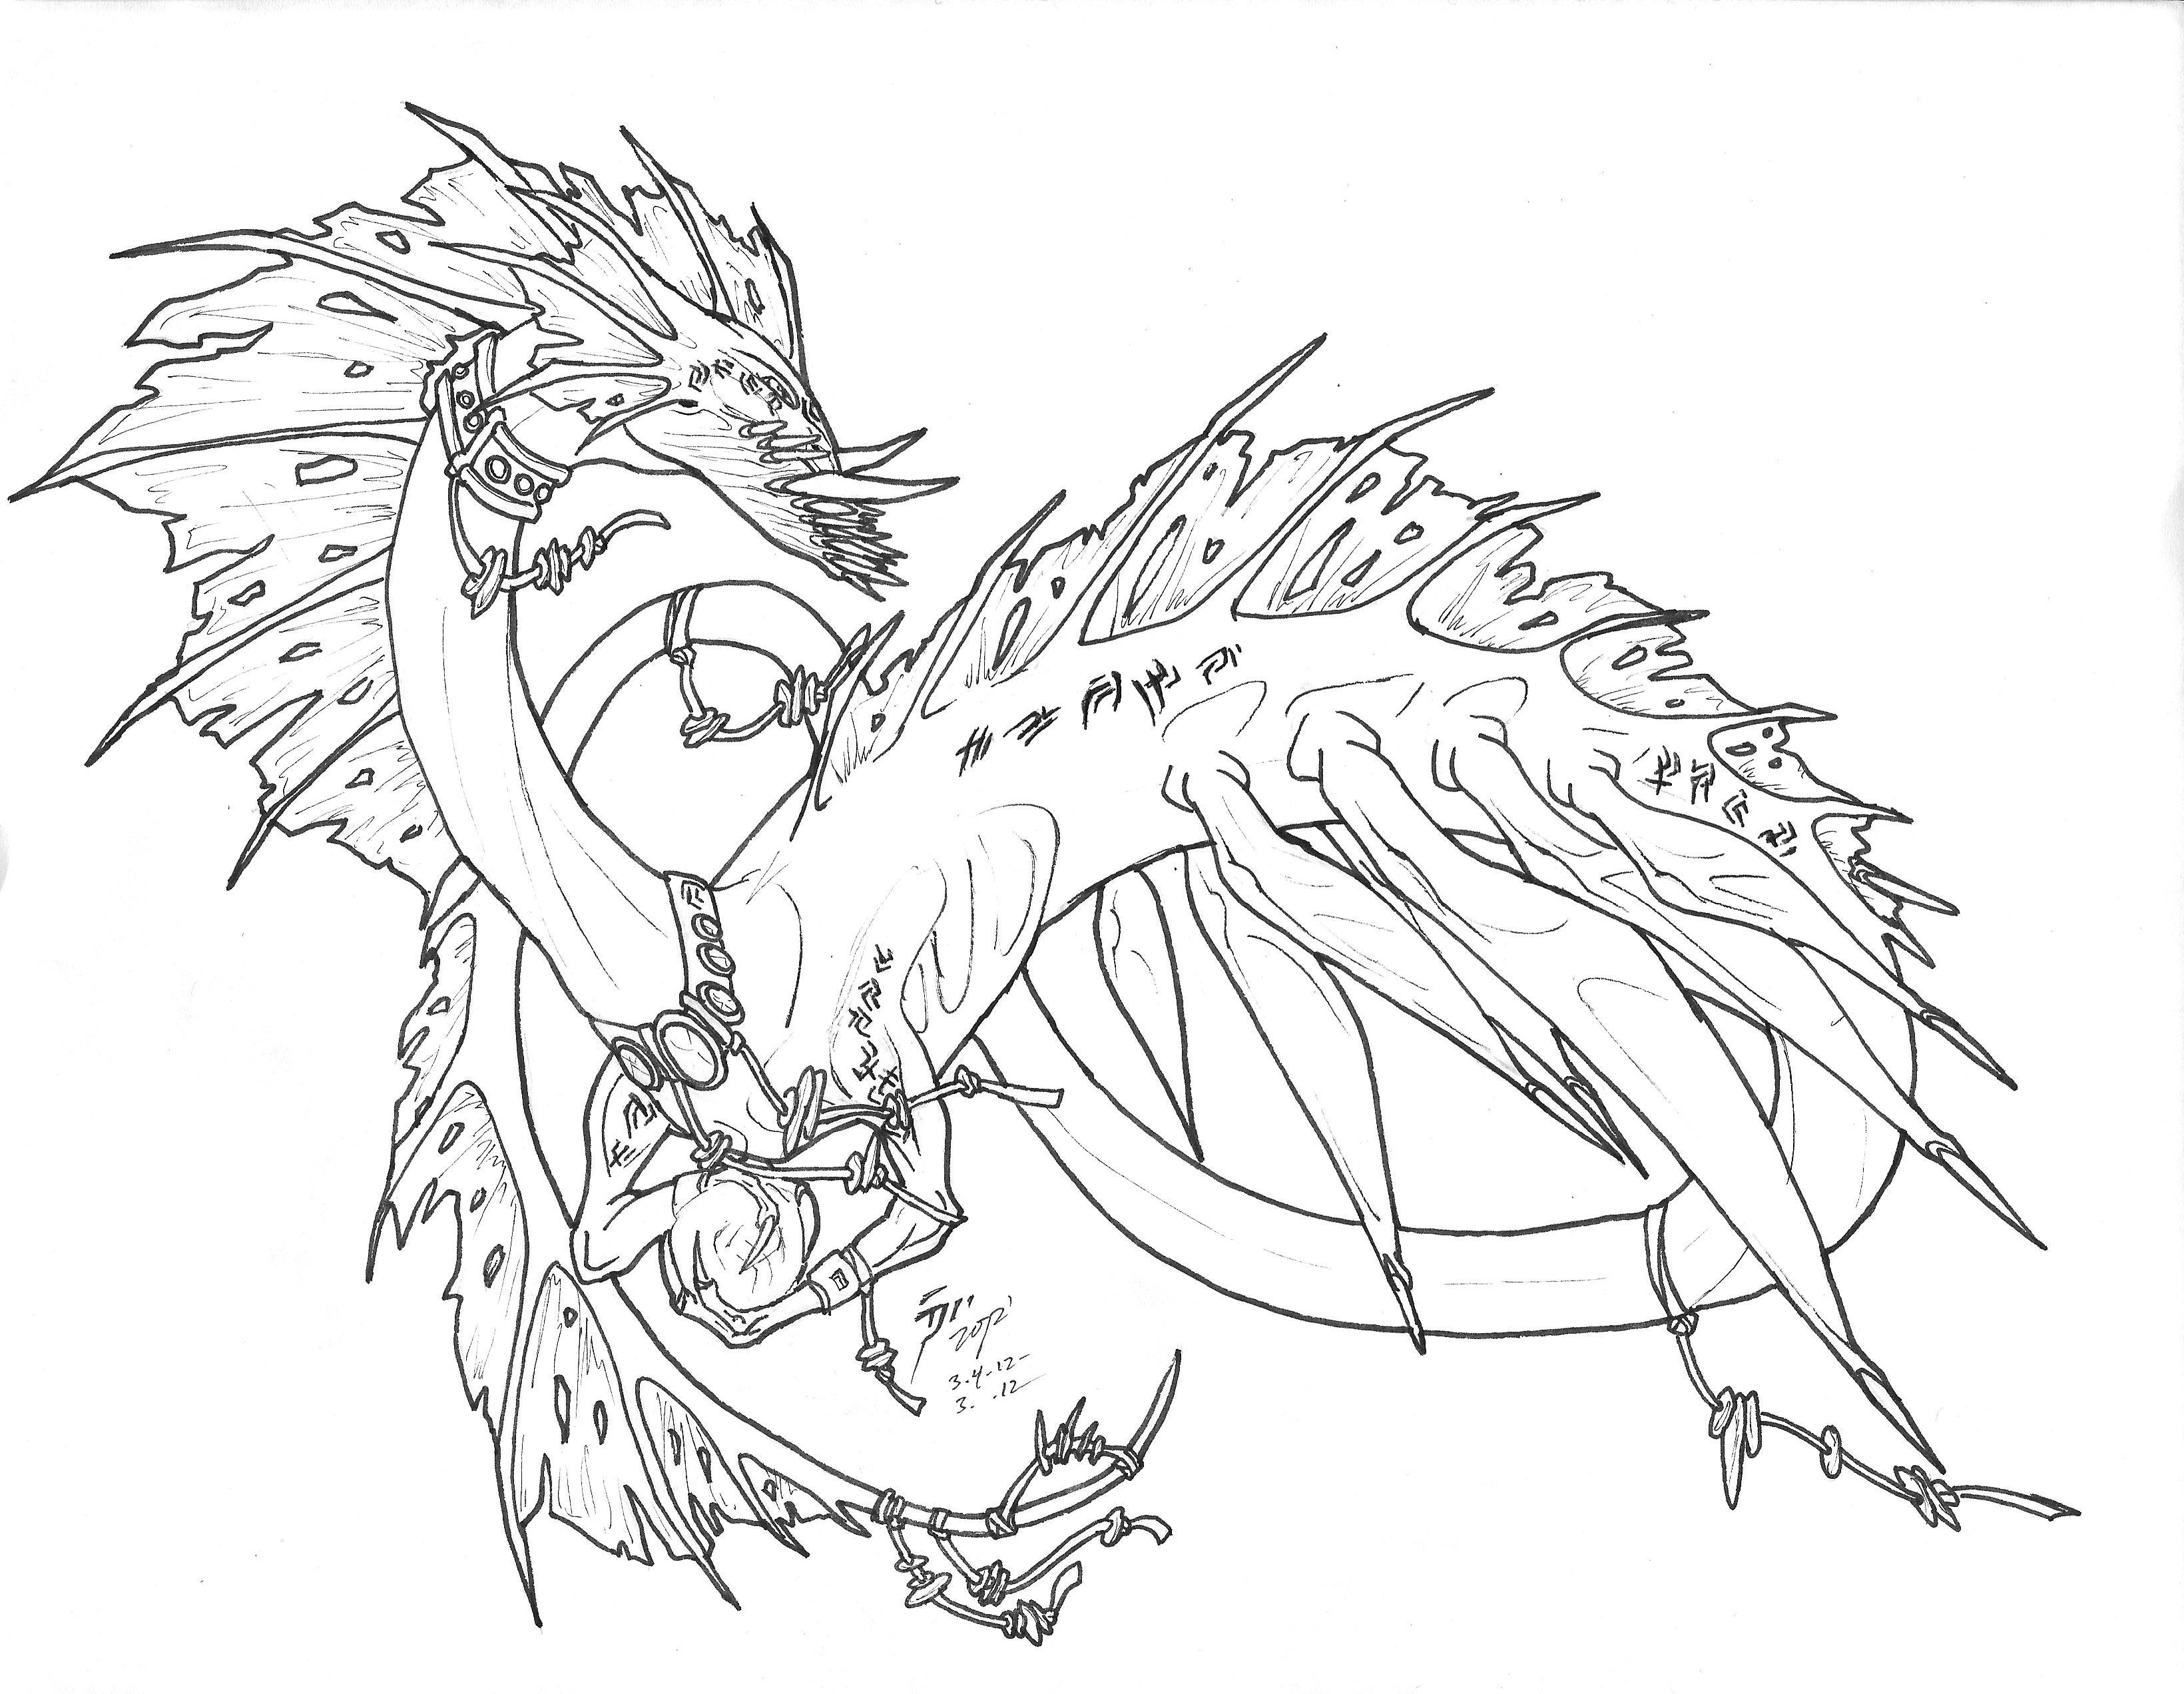 Coloring Pages Sea Serpent Coloring Pages sea serpent inked by tsunami noboru on deviantart noboru